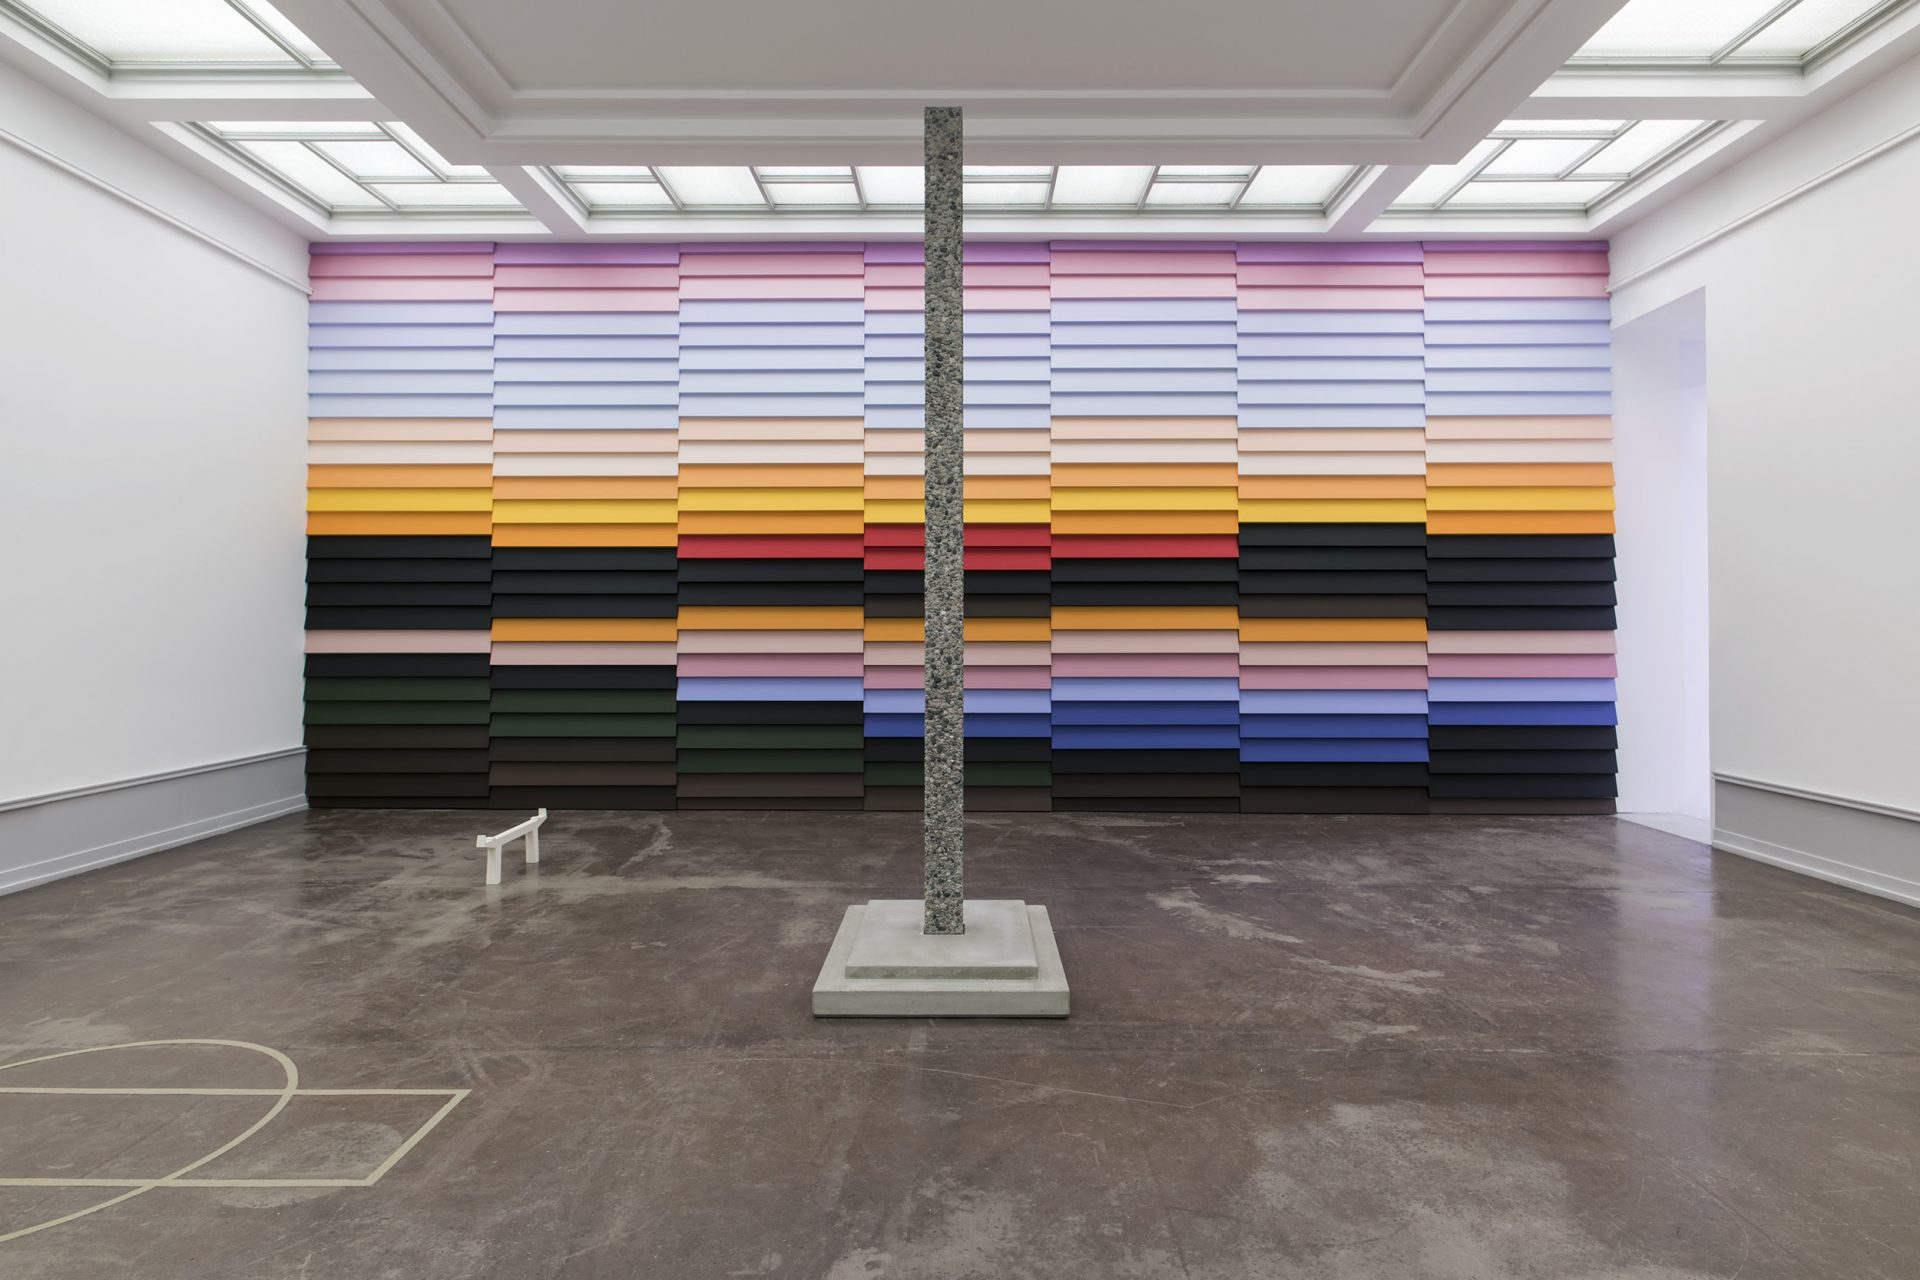 20.09.21 – Knut Henrik Henriksen in Art Basel | Parcours, 20-26 September 2021